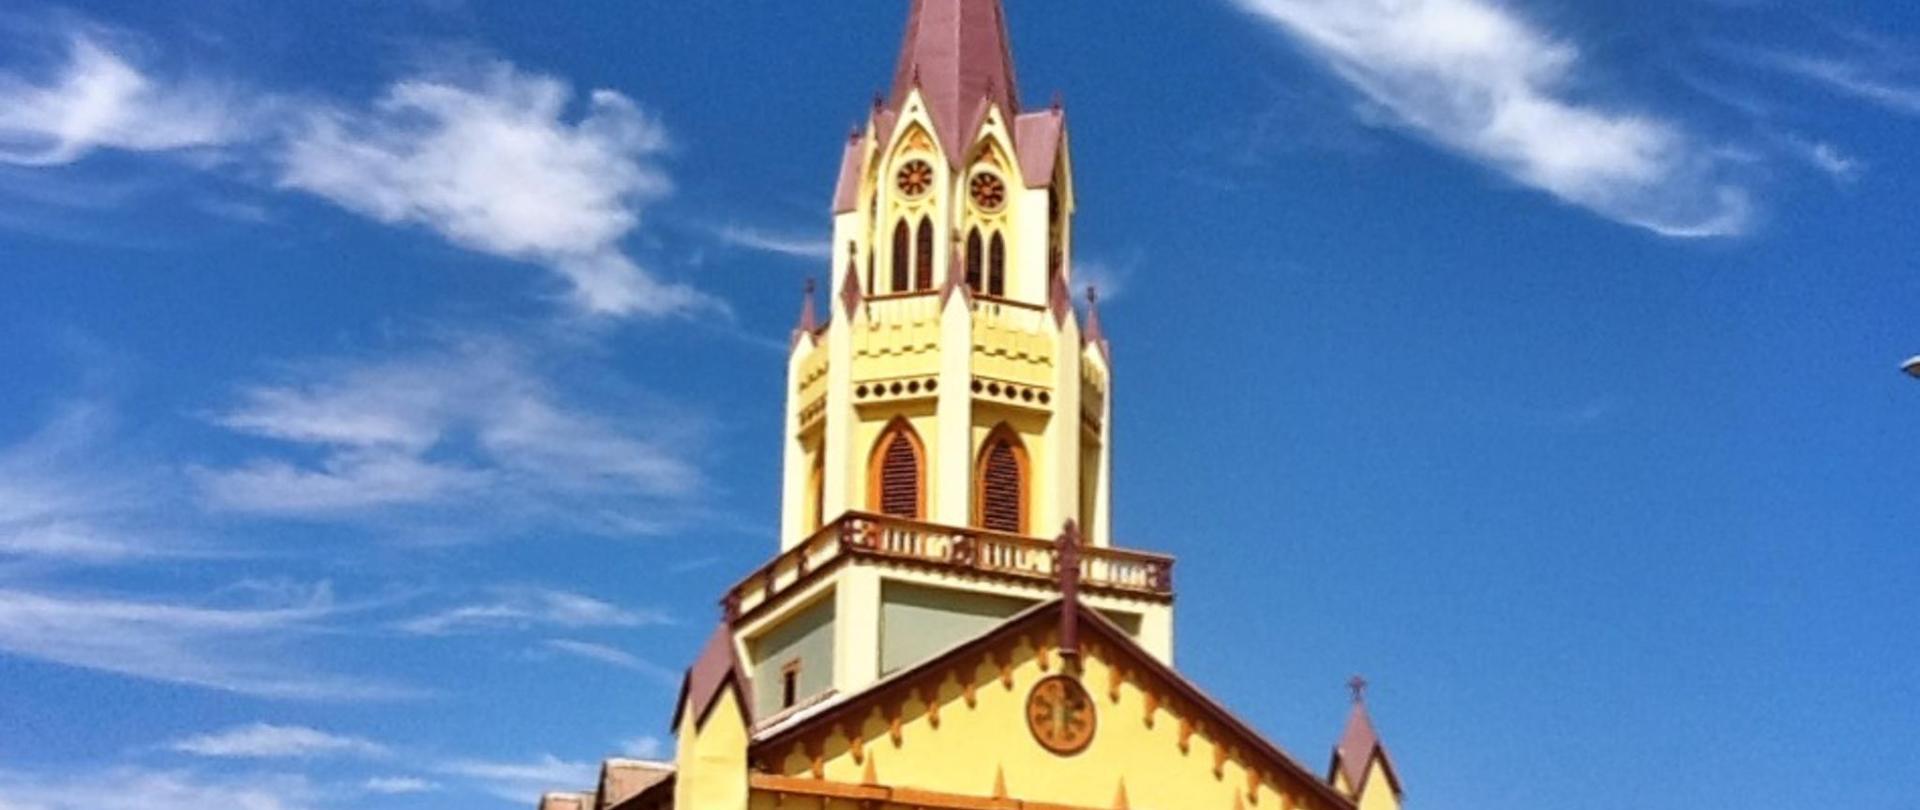 iglesia-san-vicente-de-paul-Caldera.JPG